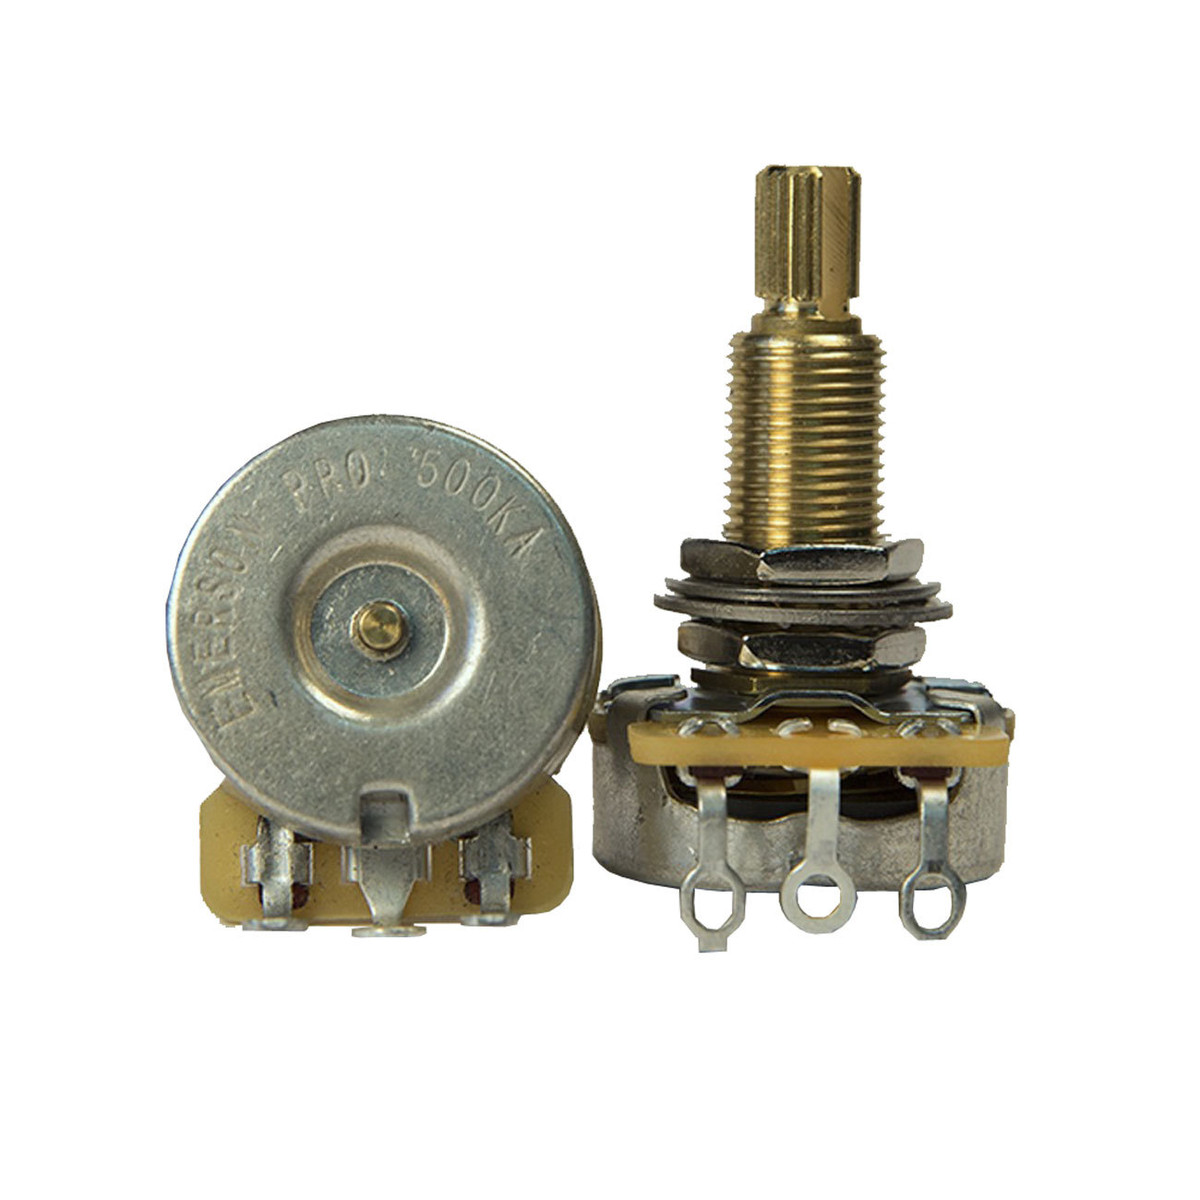 Image of Emerson Custom CTS 500K Long Split Shaft Pro Potentiometer